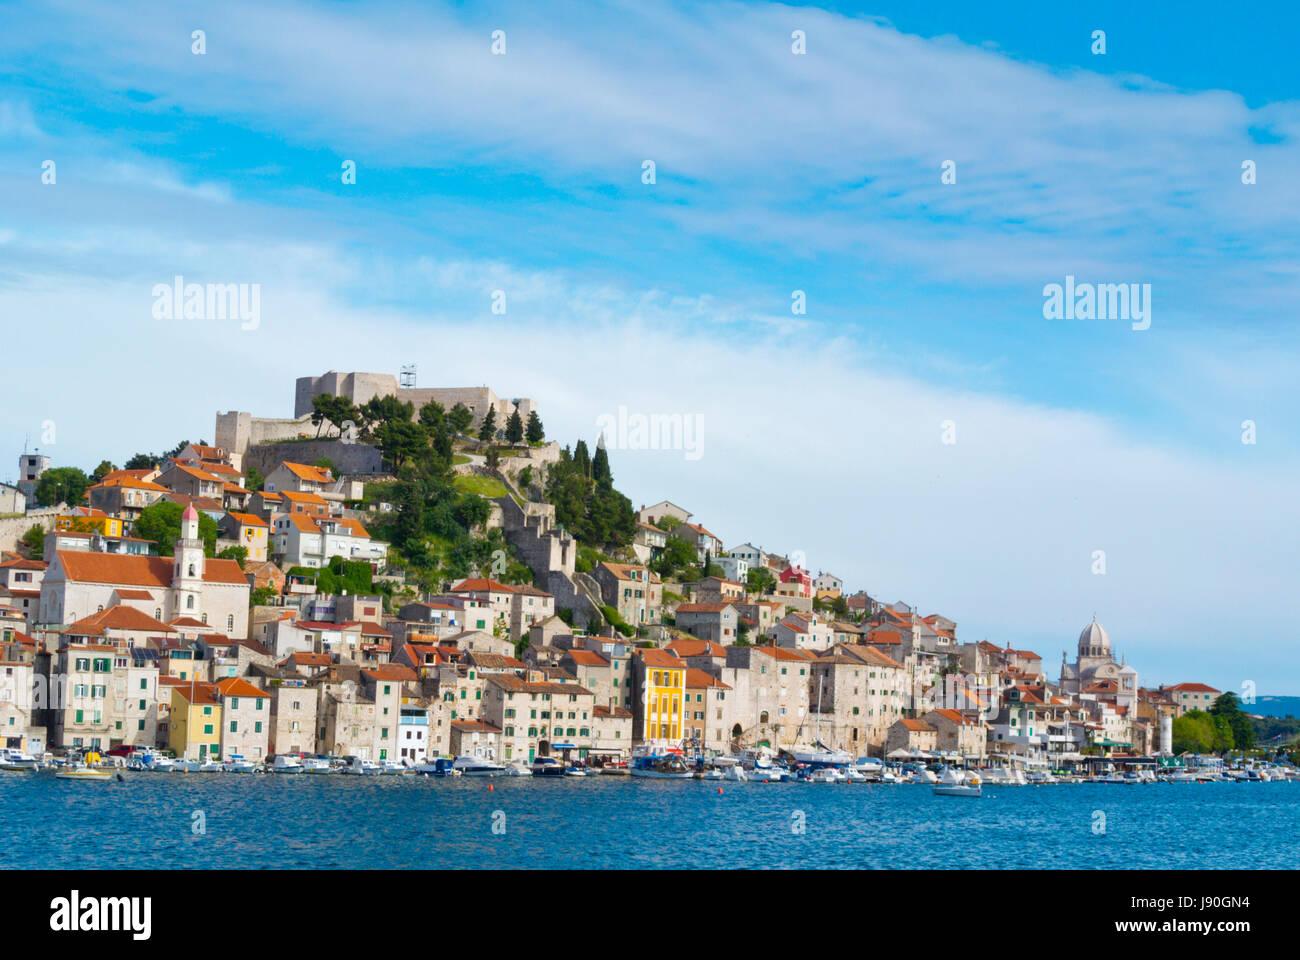 St Michaels Festung auf Hügel, Dolac Nachbarschaft, Sibenik, Dalmatien, Kroatien Stockbild